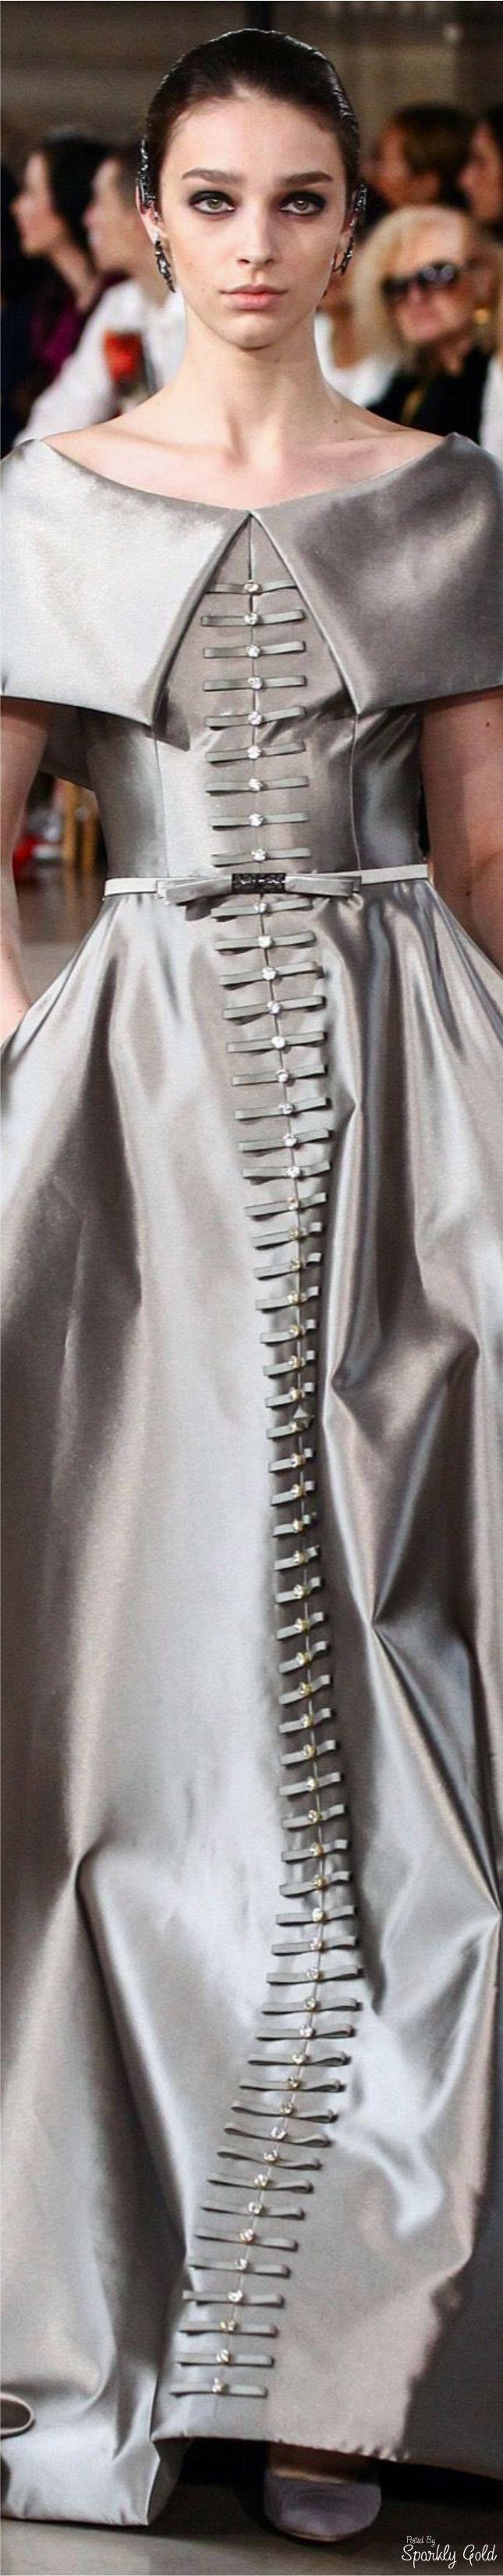 Georges Hobeika Fall 2016 Couture  www.georgeshobeika.com